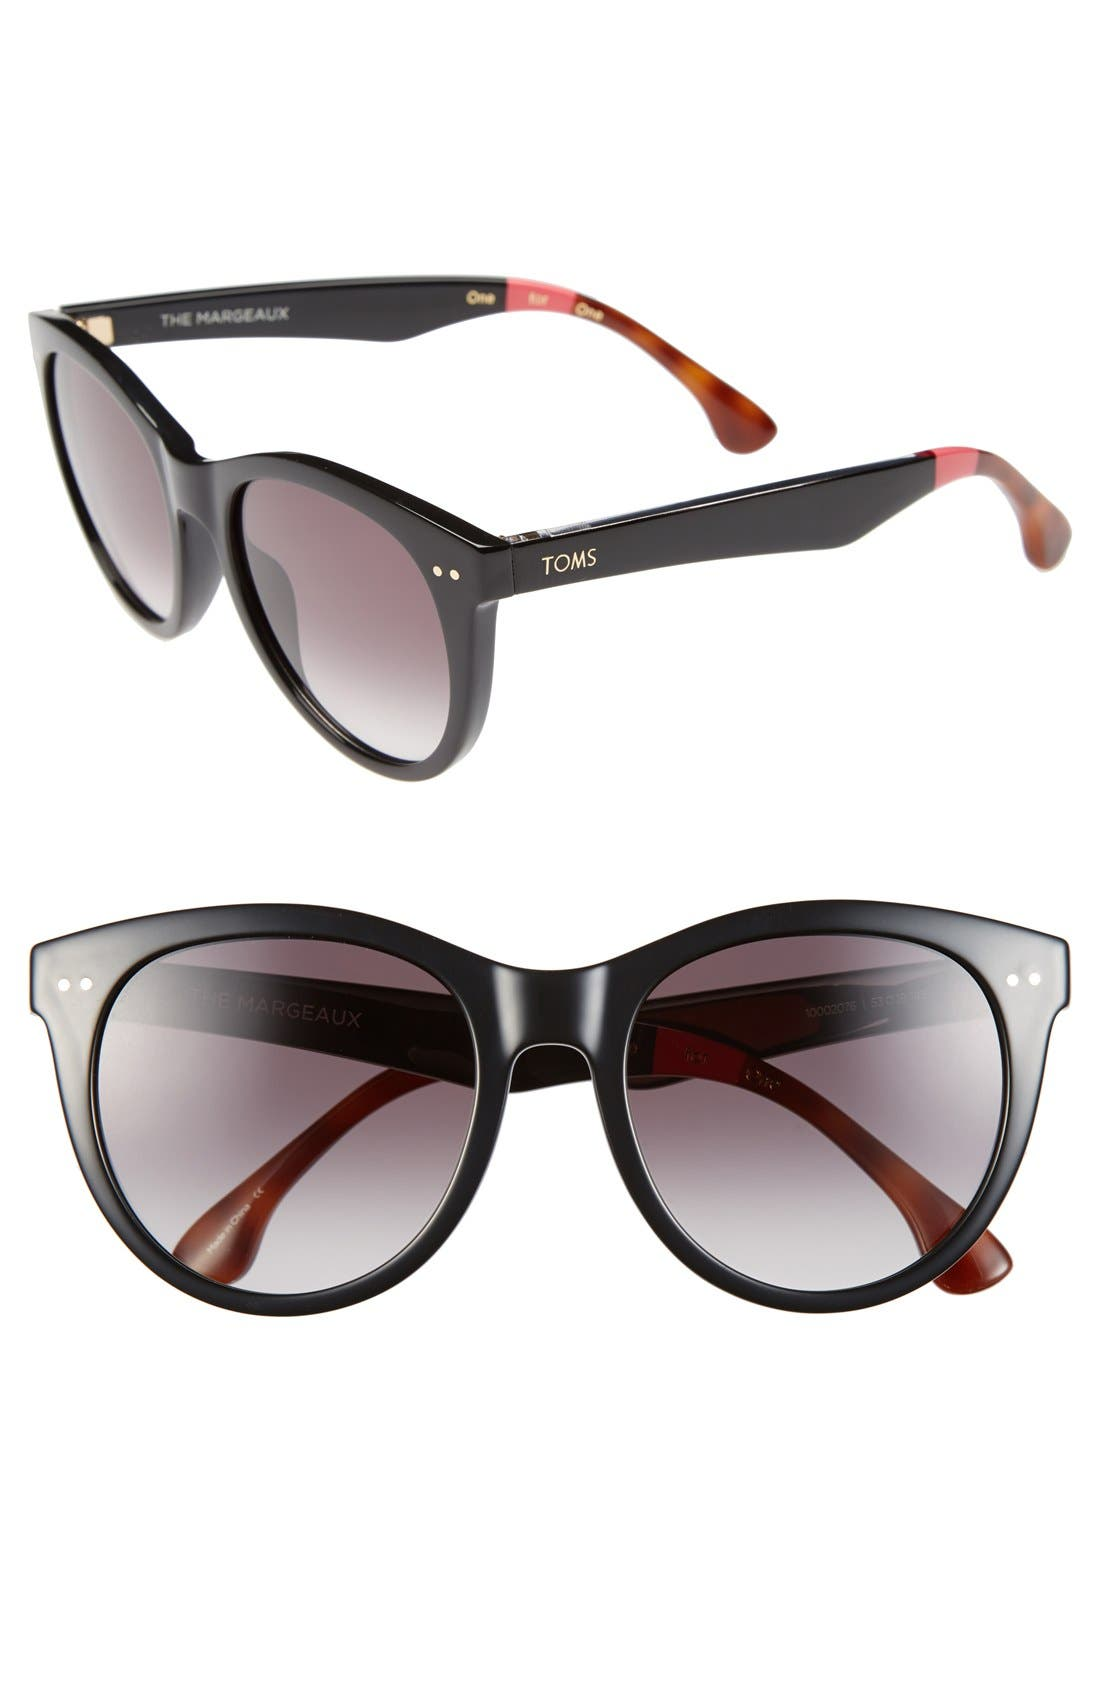 Main Image - TOMS 'Margeaux' 53mm Sunglasses